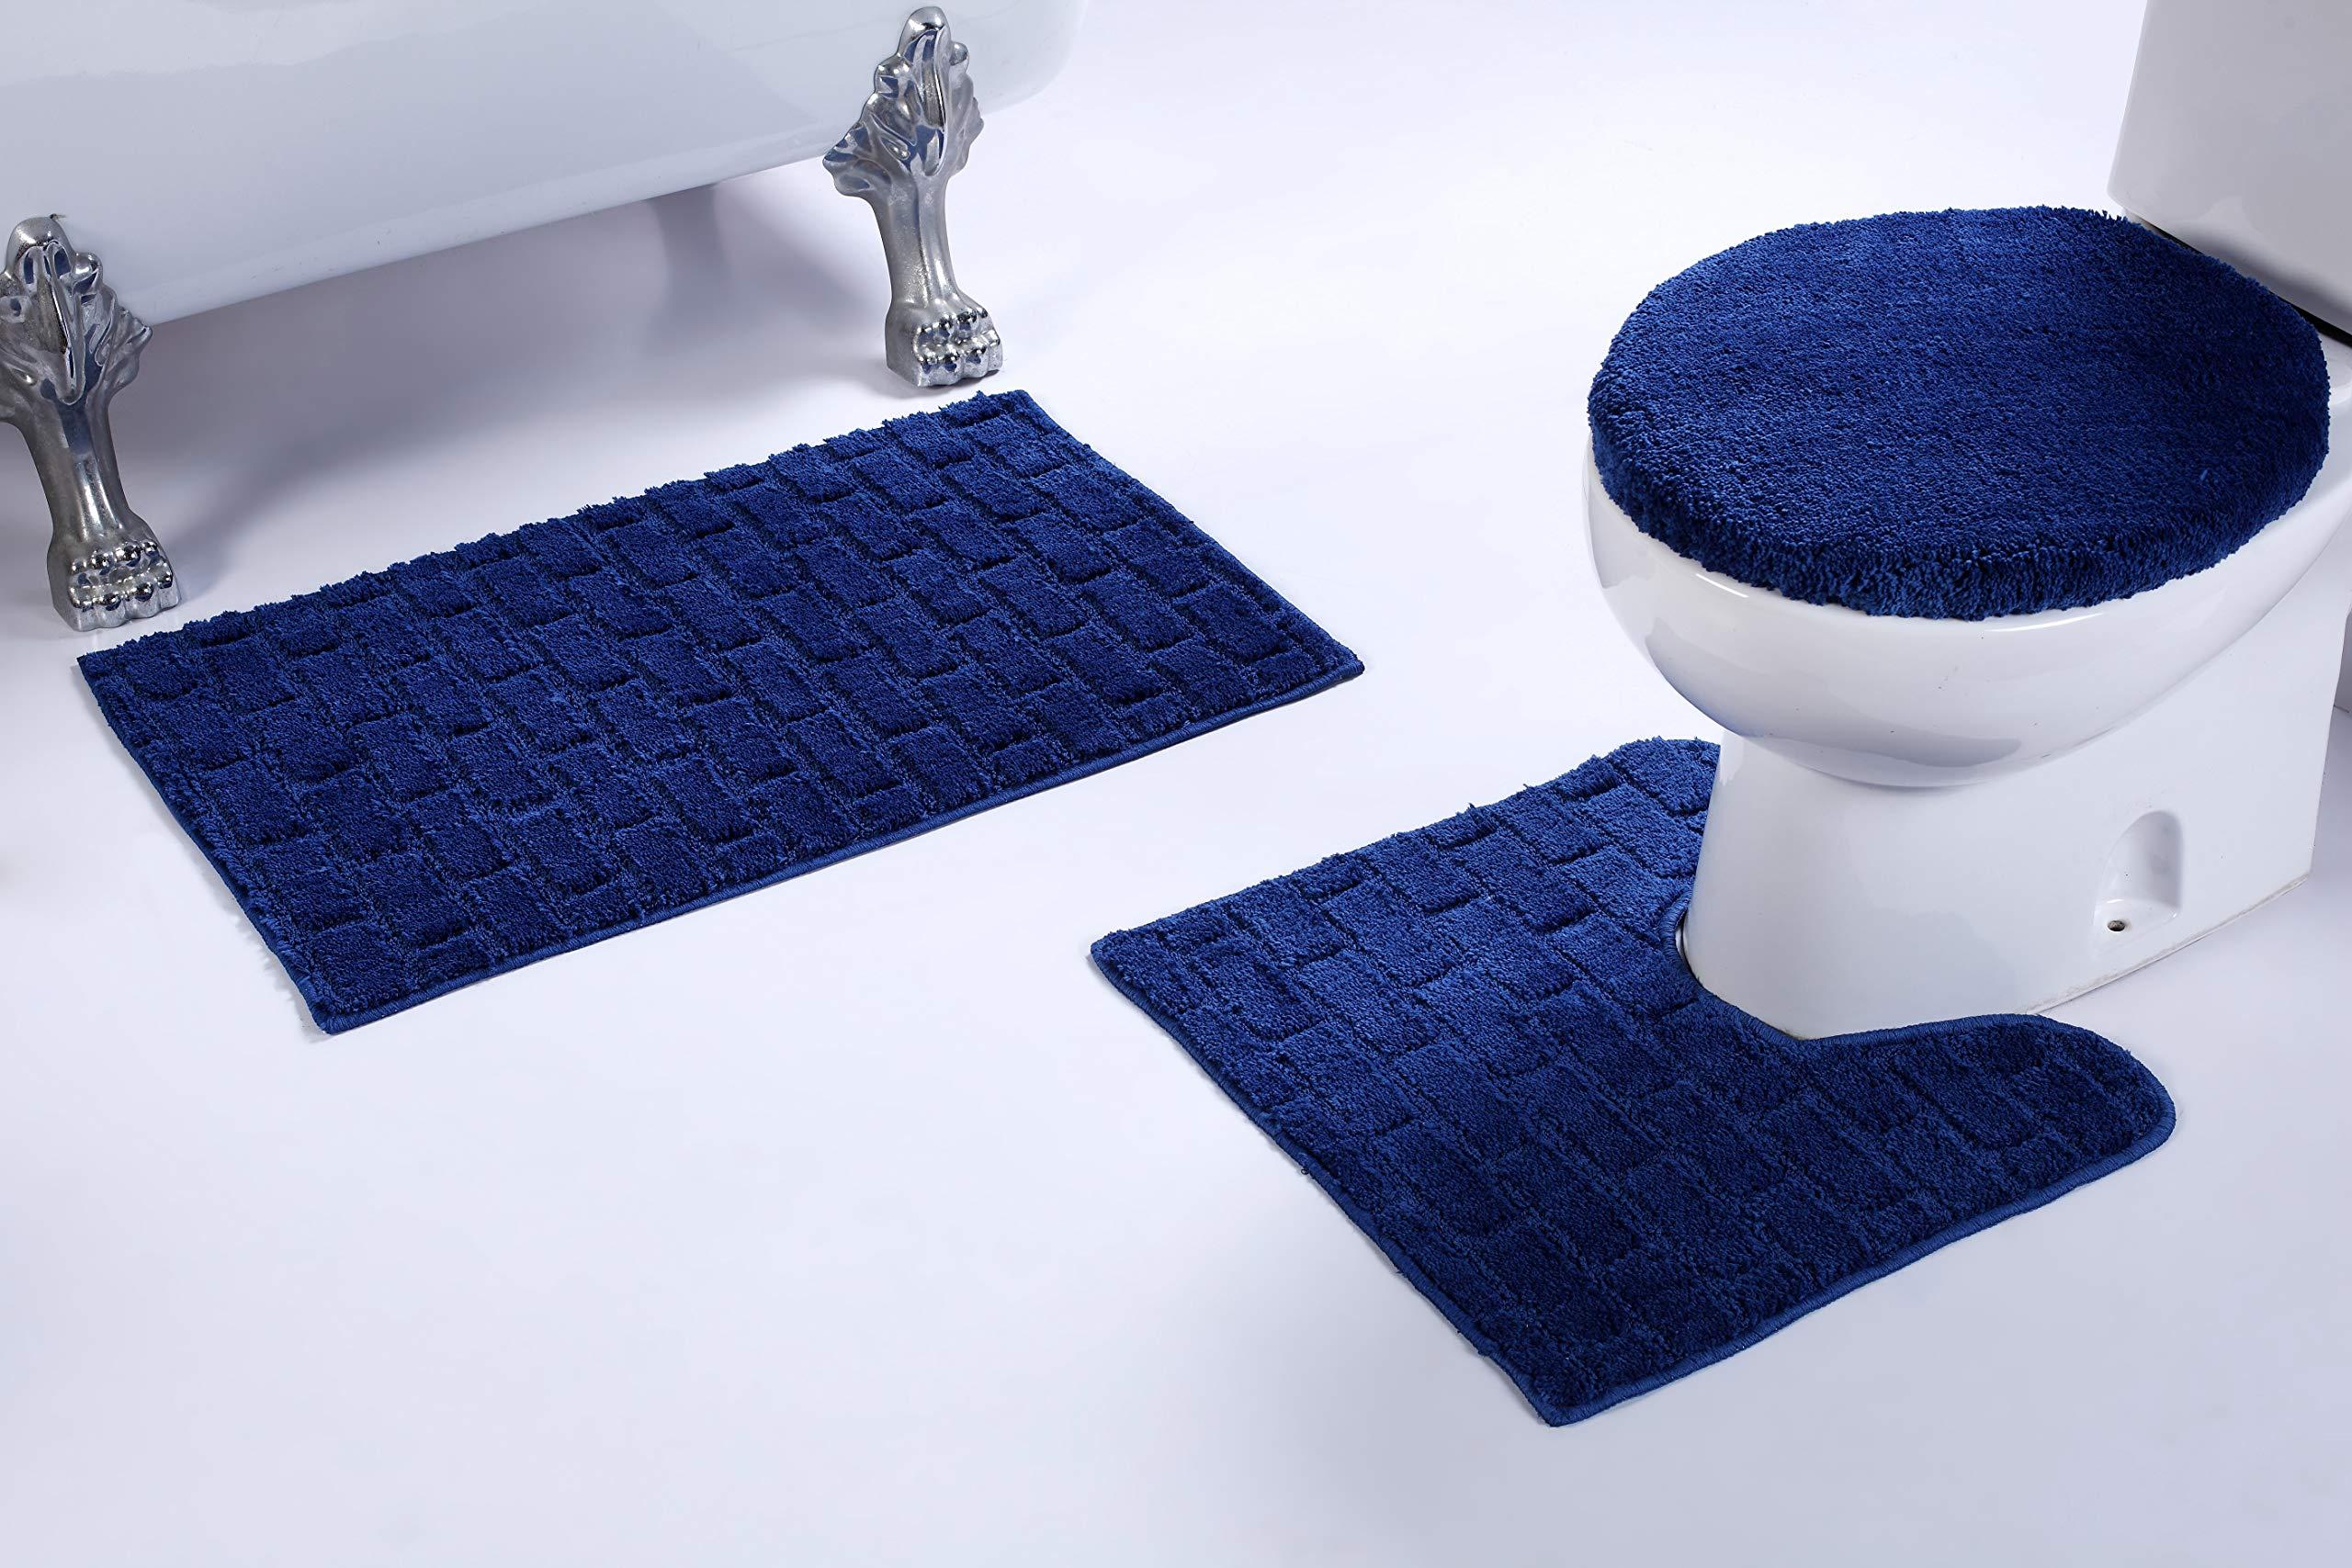 Fancy Linen 3pc Non-Slip Bath Mat Set with Brick Pattern Solid Navy Blue Bathroom U-Shaped Contour Rug, Mat and Toilet Lid Cover New # Bath 67 by Fancy Linen LLC